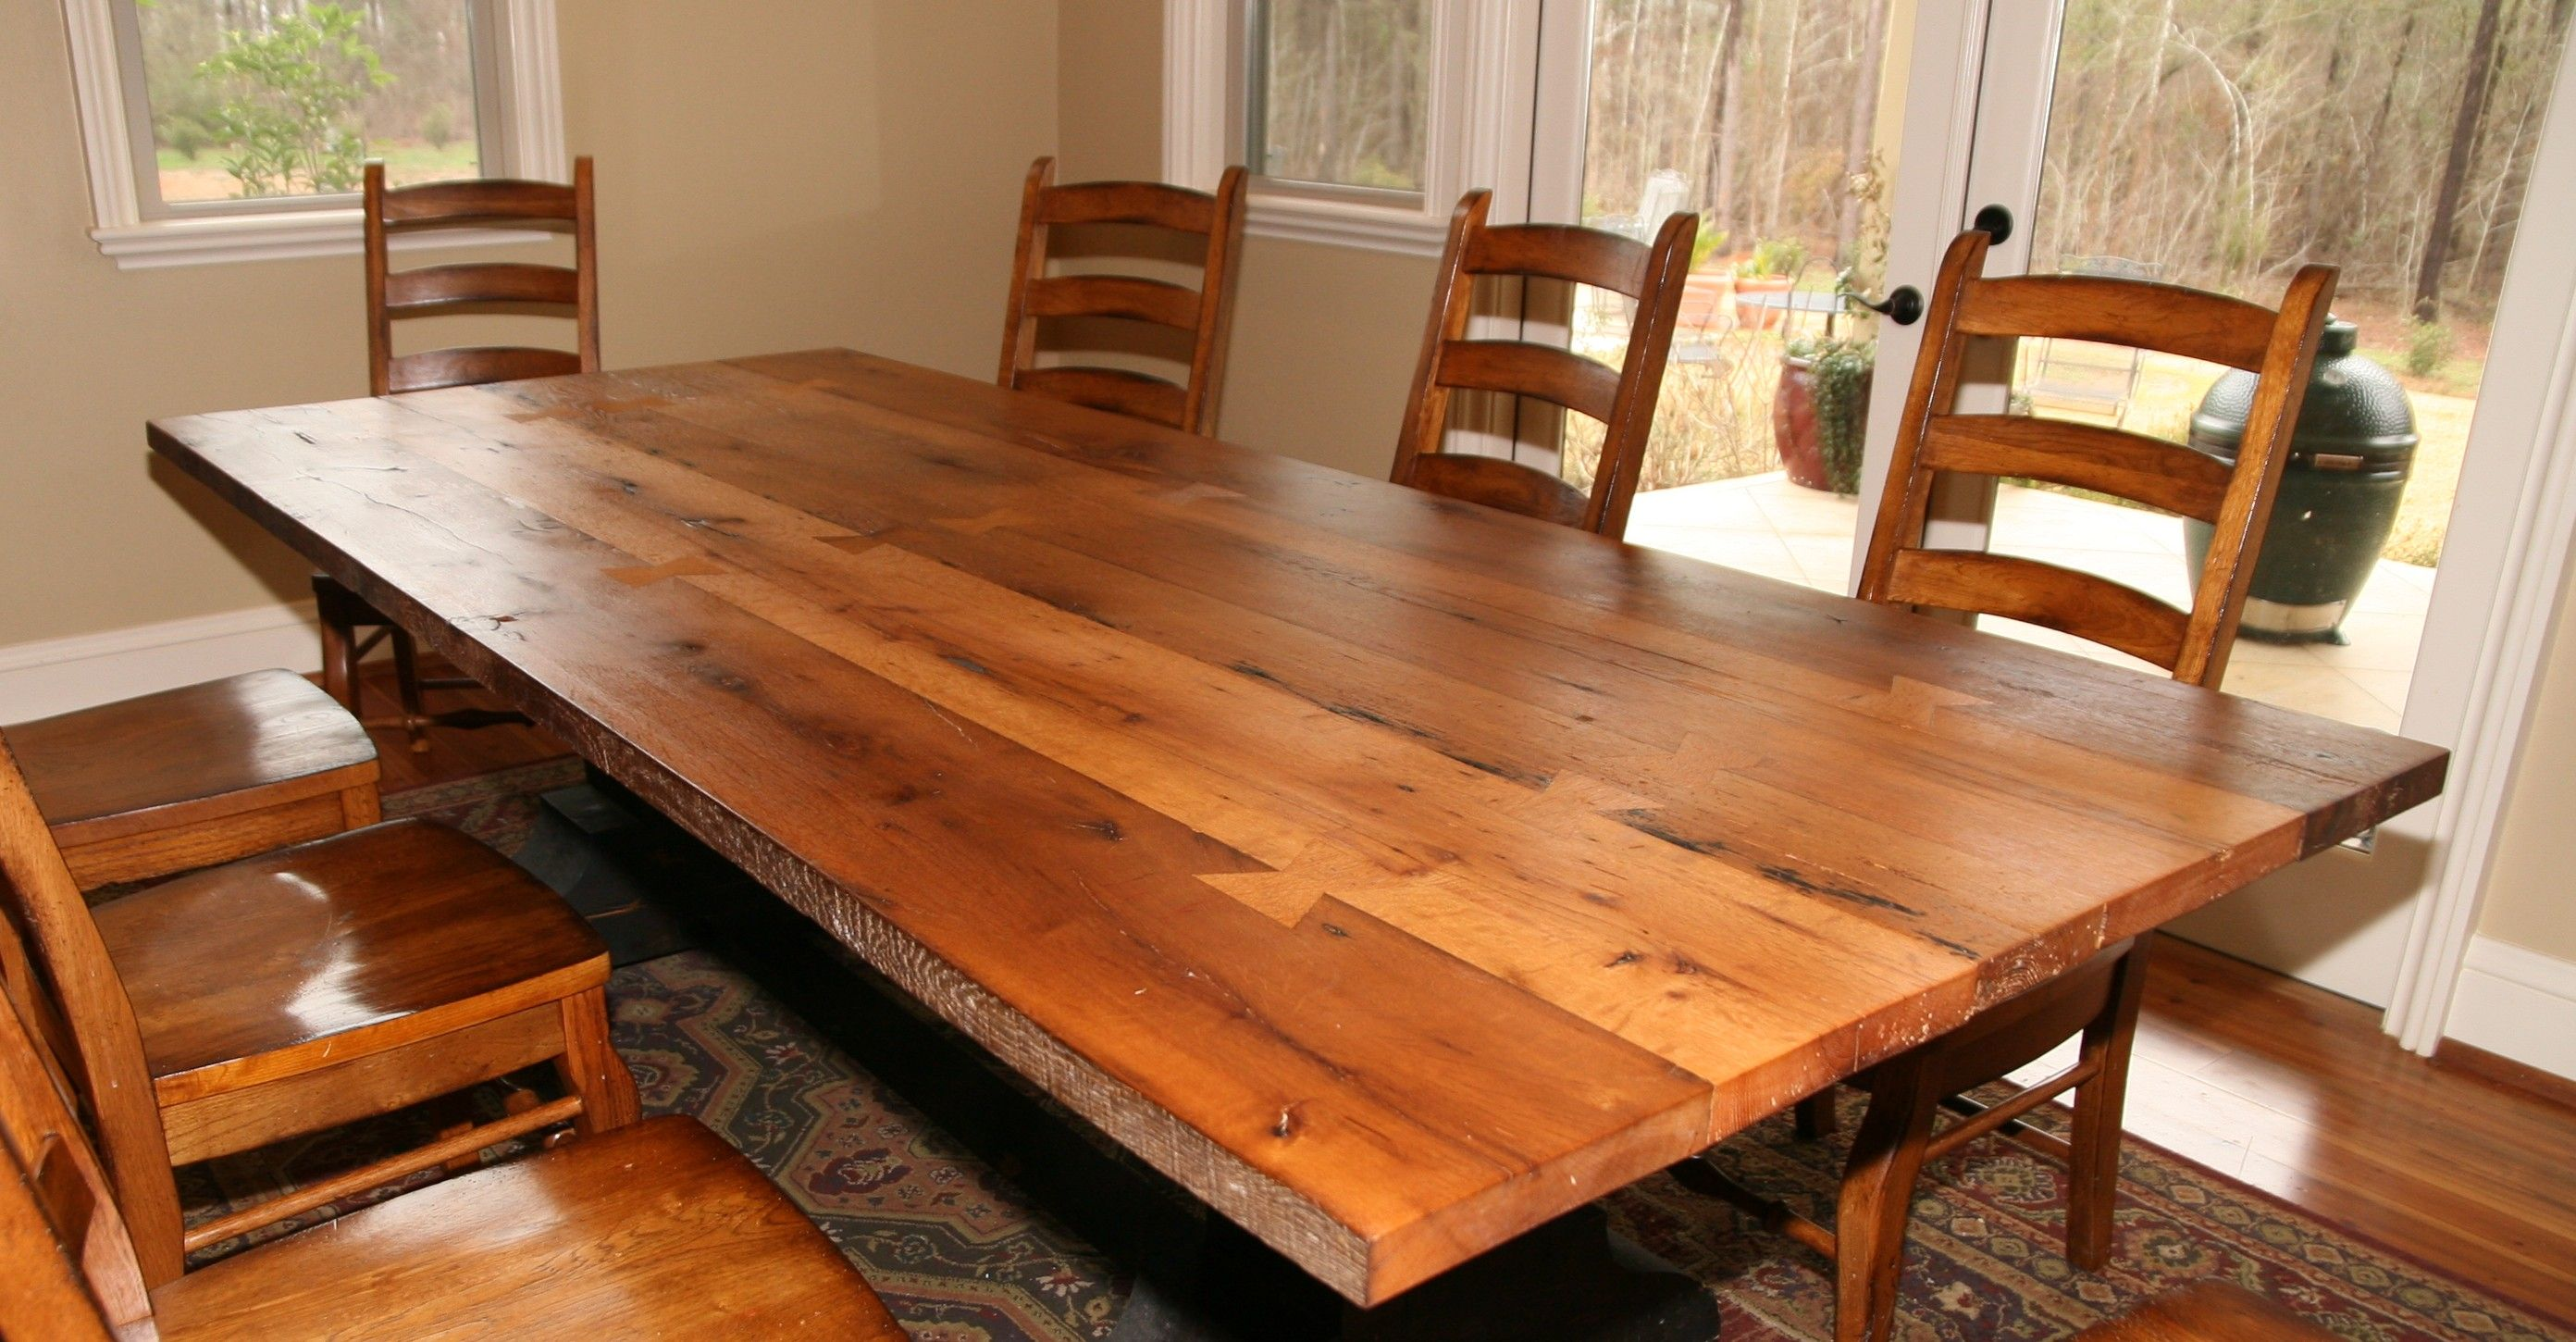 Custom Dining Room Table  Furniture  Pinterest  Dining Room Captivating Custom Dining Room Tables Inspiration